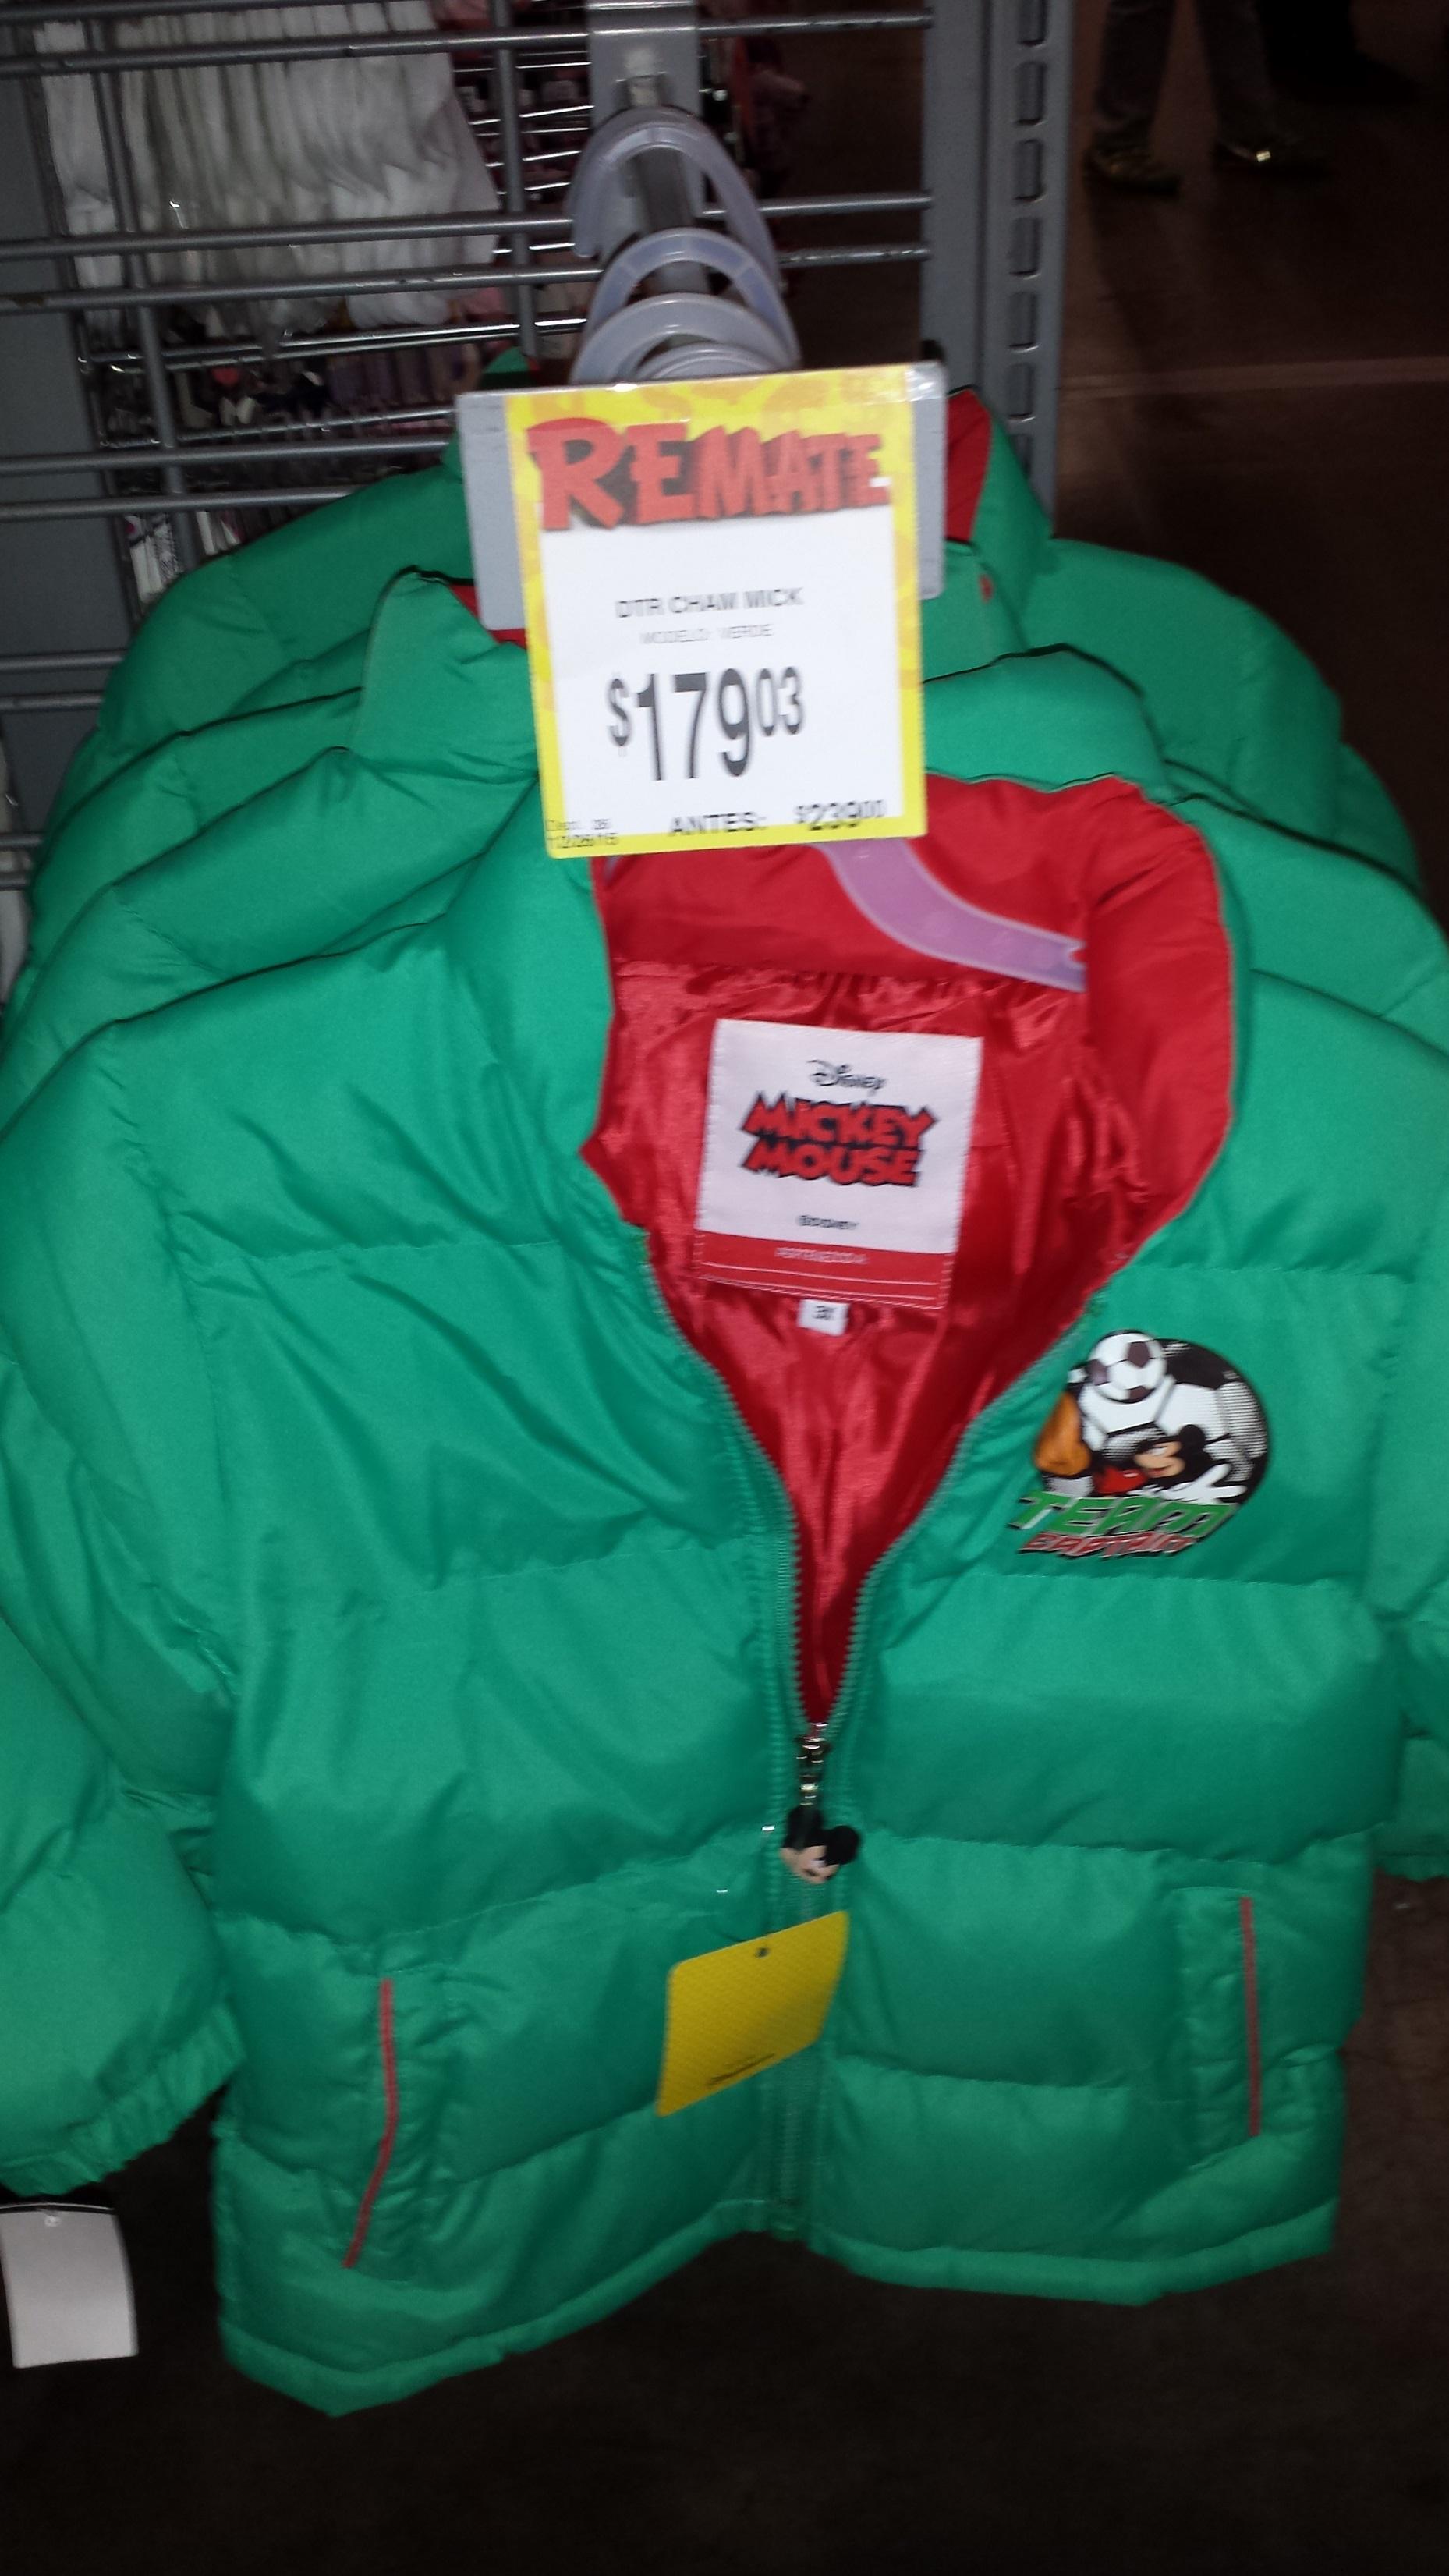 Bodega Aurrerá Los Reyes: Chamarras de Disney a $179.03